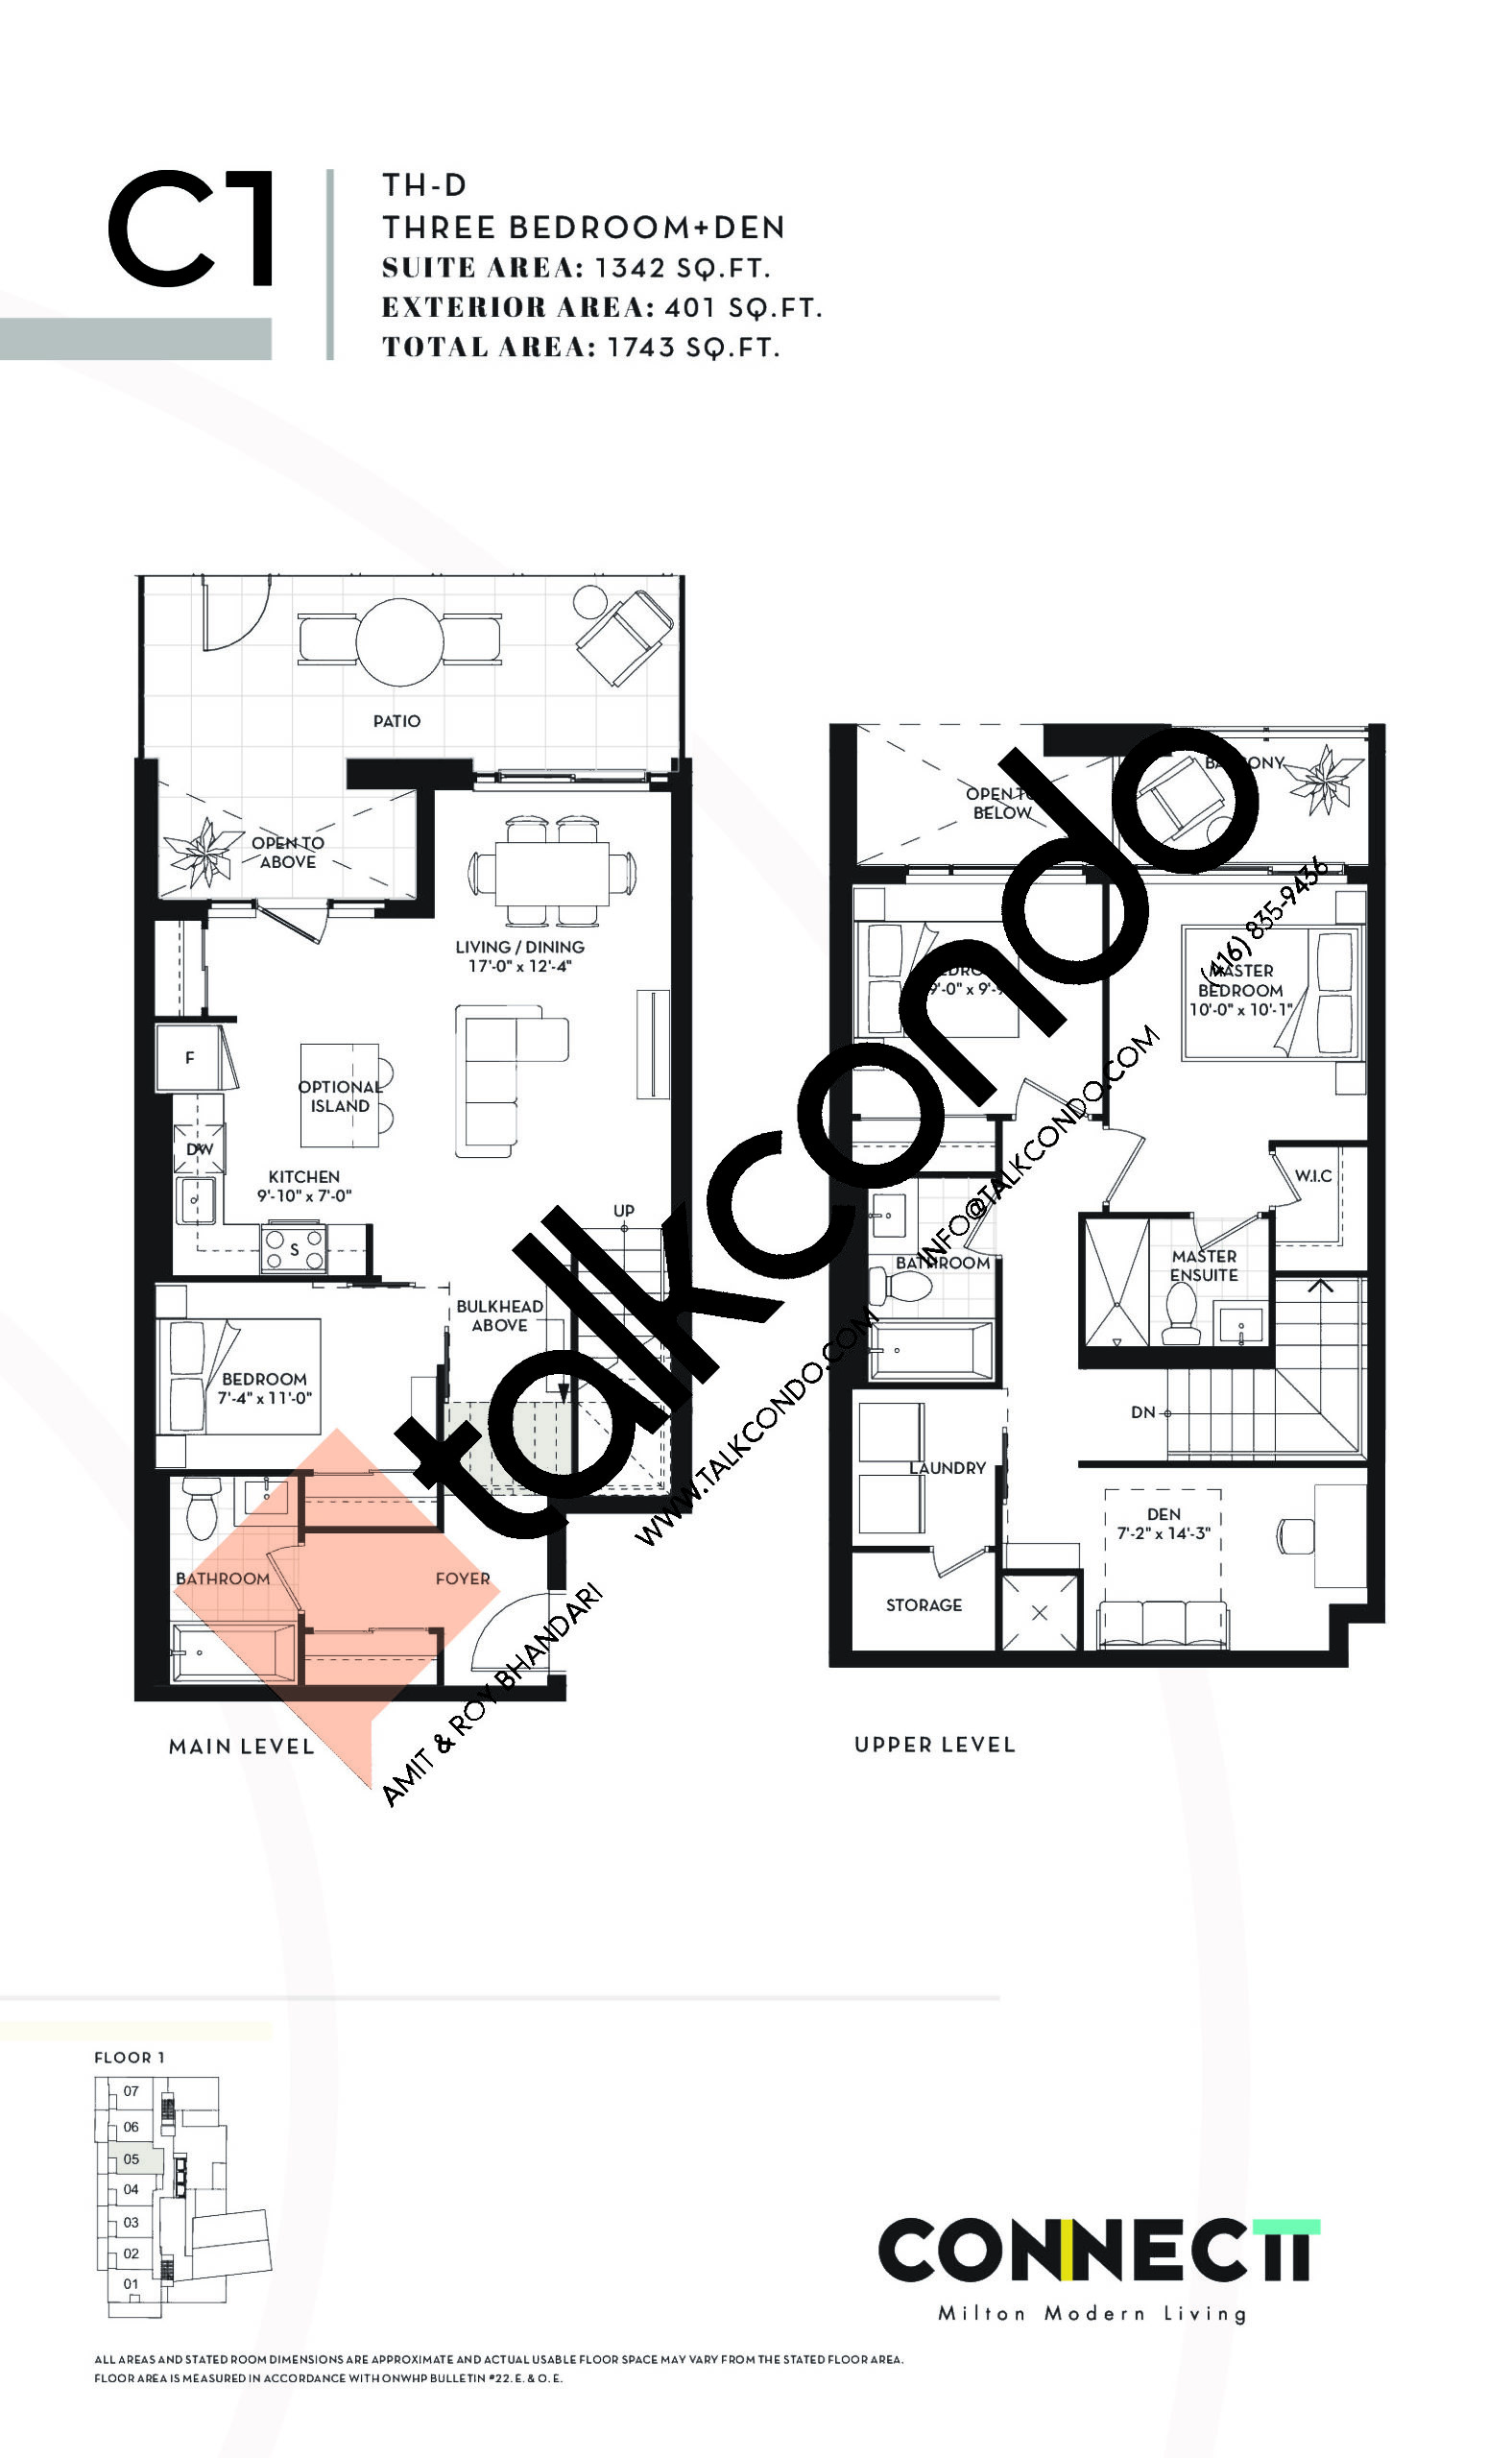 TH-D Floor Plan at Connectt Urban Community Condos - 1342 sq.ft